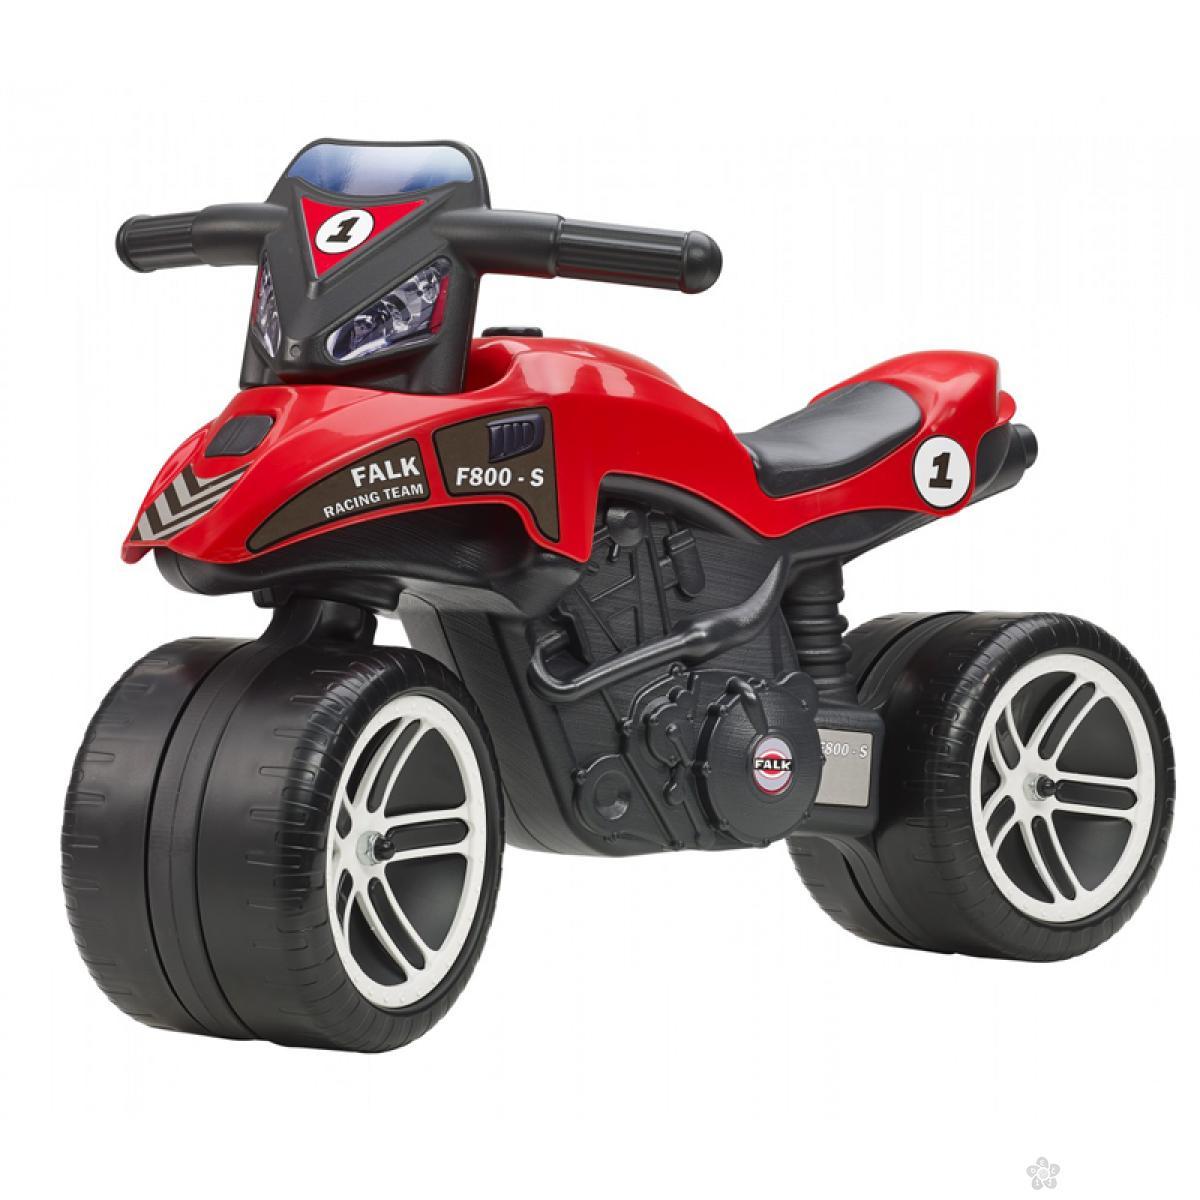 Falk Motor guralica Racing Team 500a